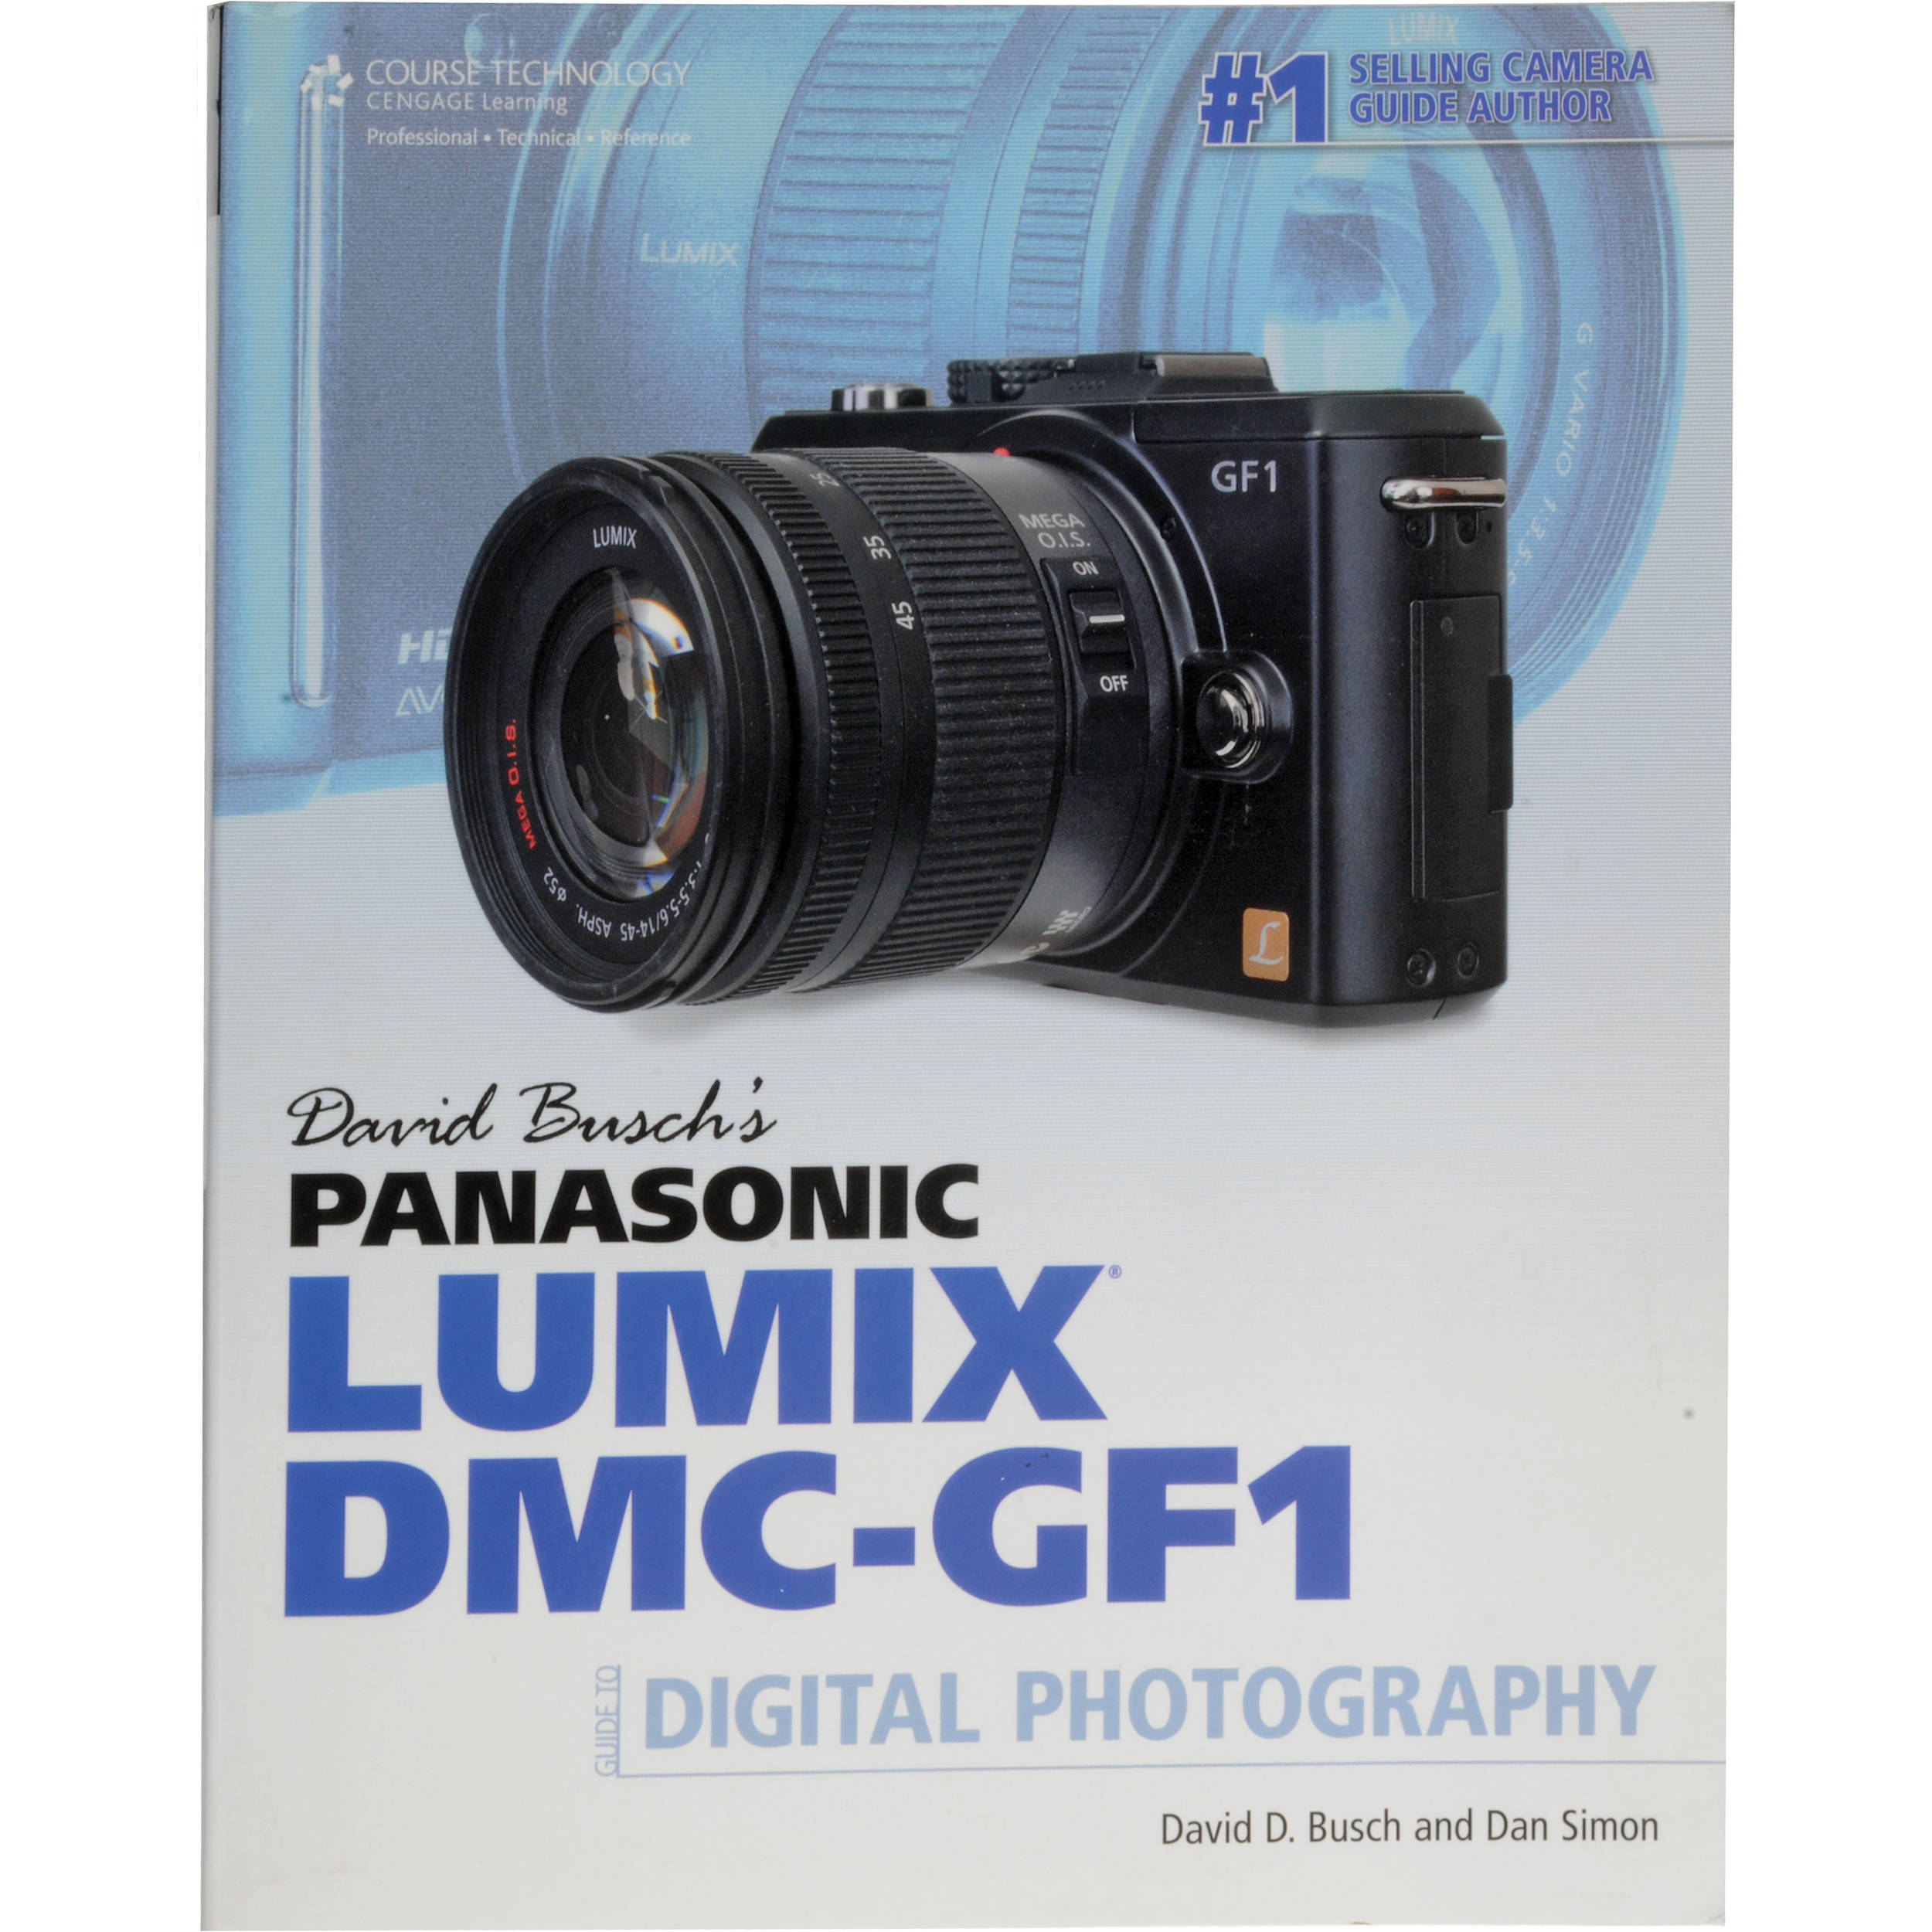 cengage course tech book david busch s panasonic 9781435457386 rh bhphotovideo com Panasonic GX9 Panasonic GF3